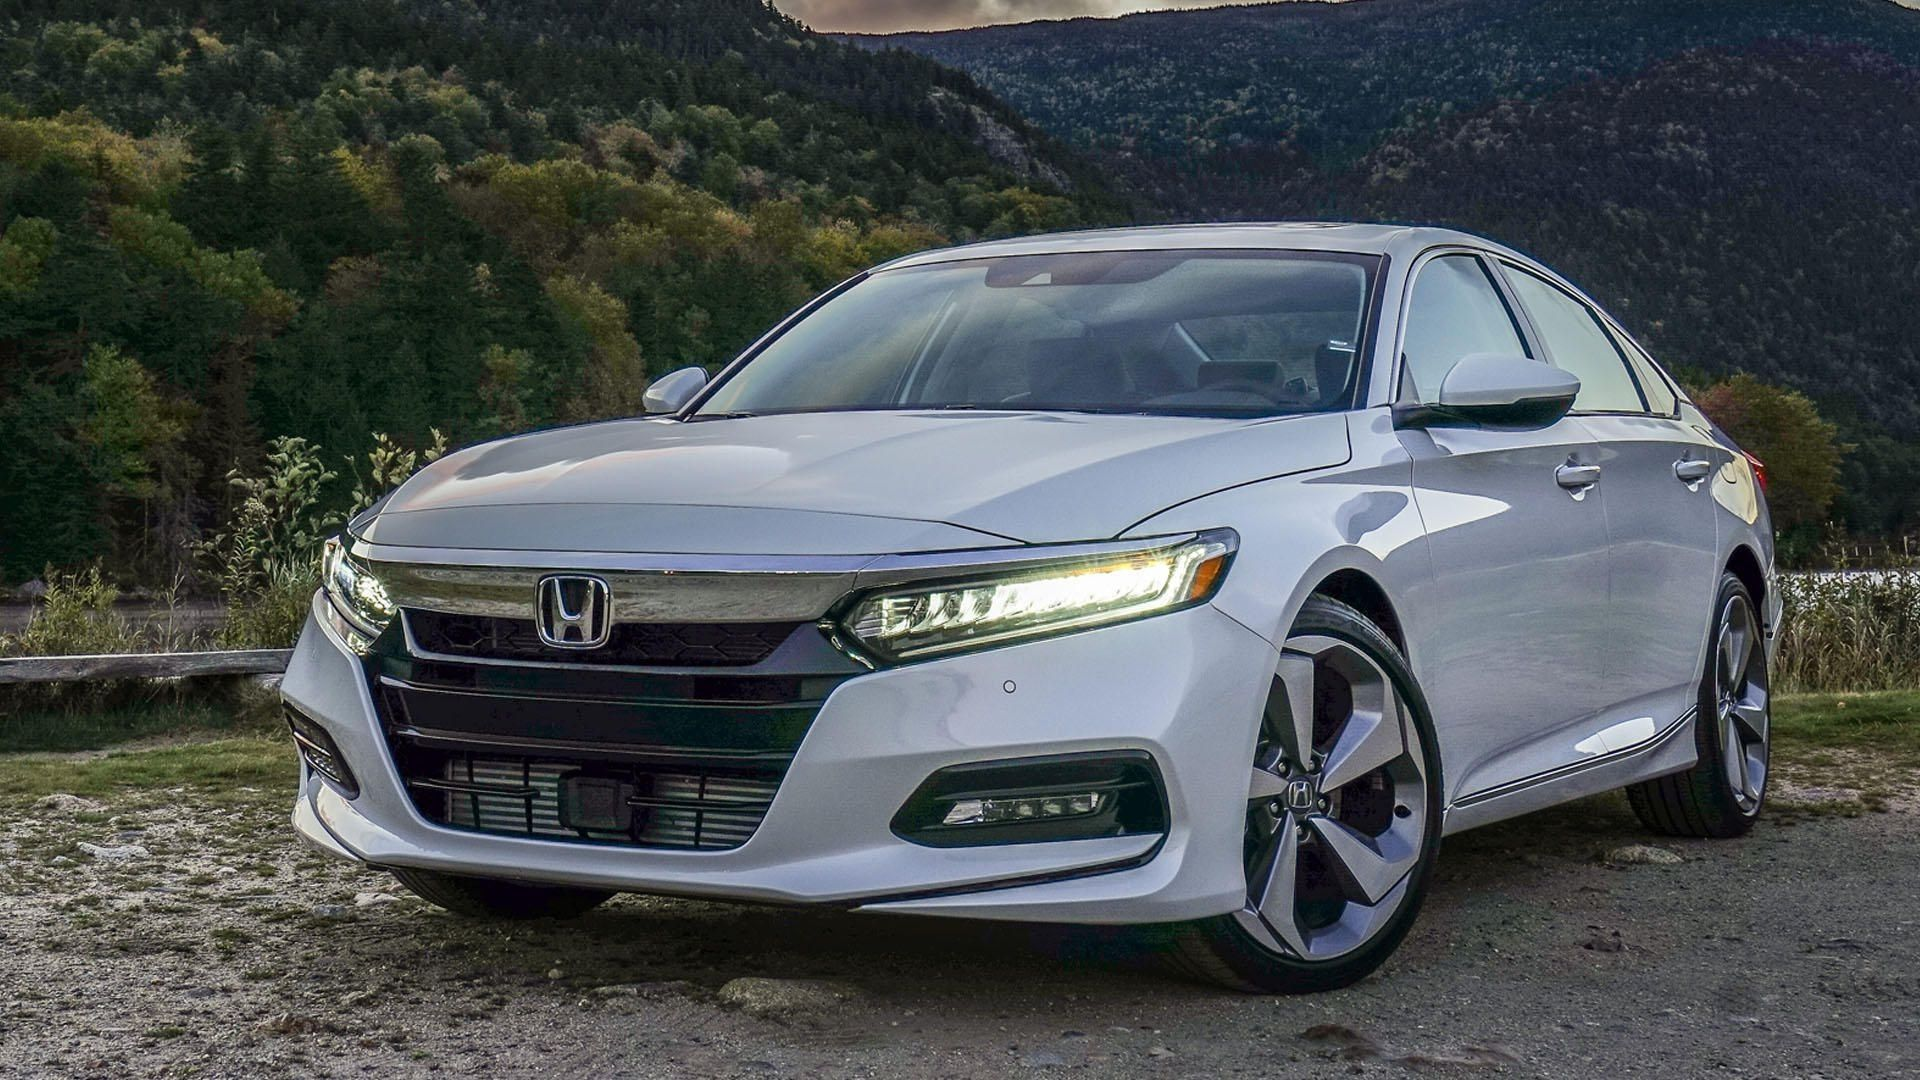 2019 Honda Accord First Drive Honda accord, Honda accord